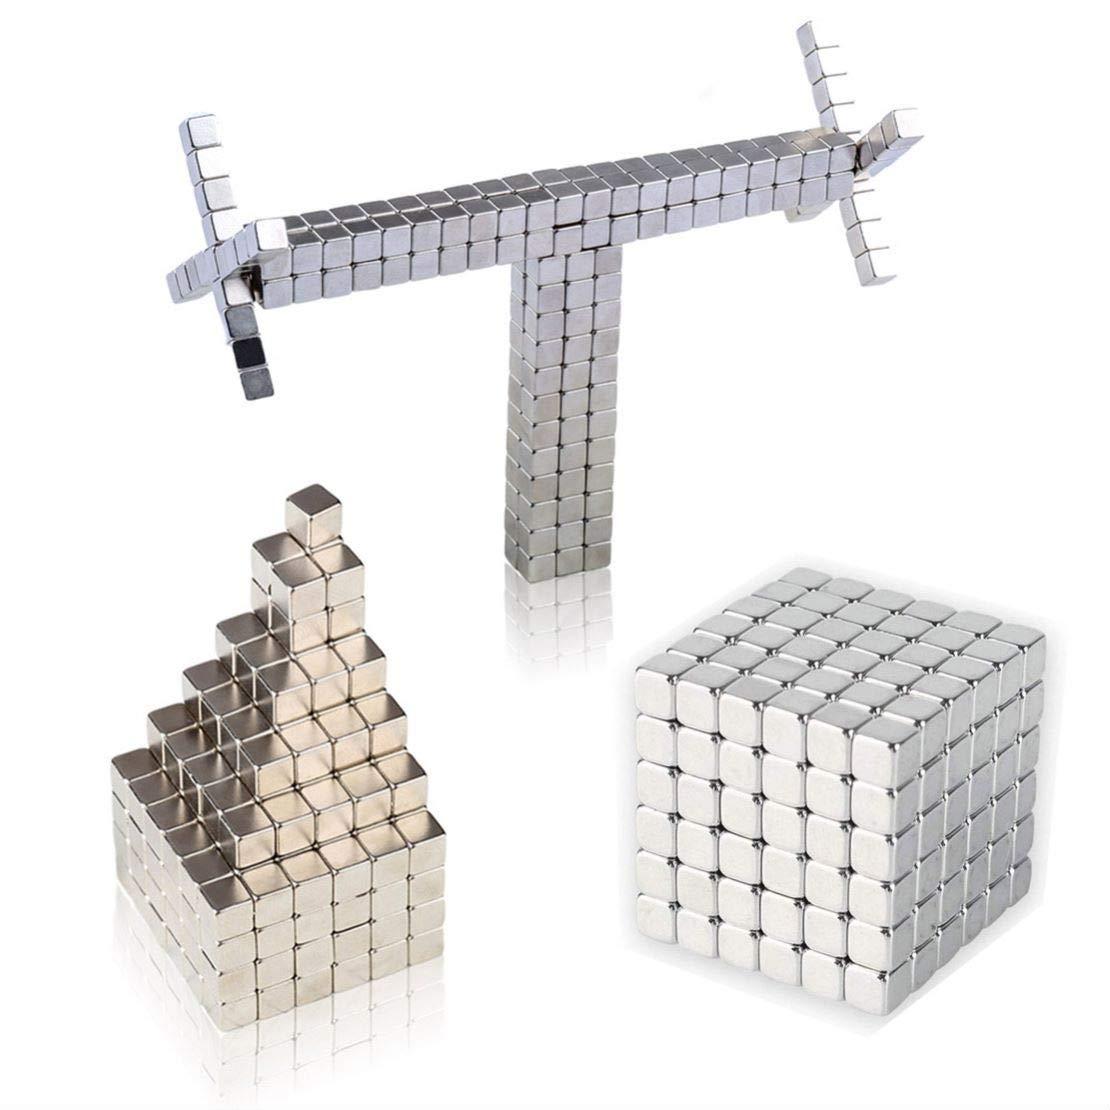 IMNED Magnetic Building 216PCS 5mm Magnets Fidget Cubes Gadget Toys Rare Earth Magnet Stress Relief Toys Office Desk Toys Desk Games